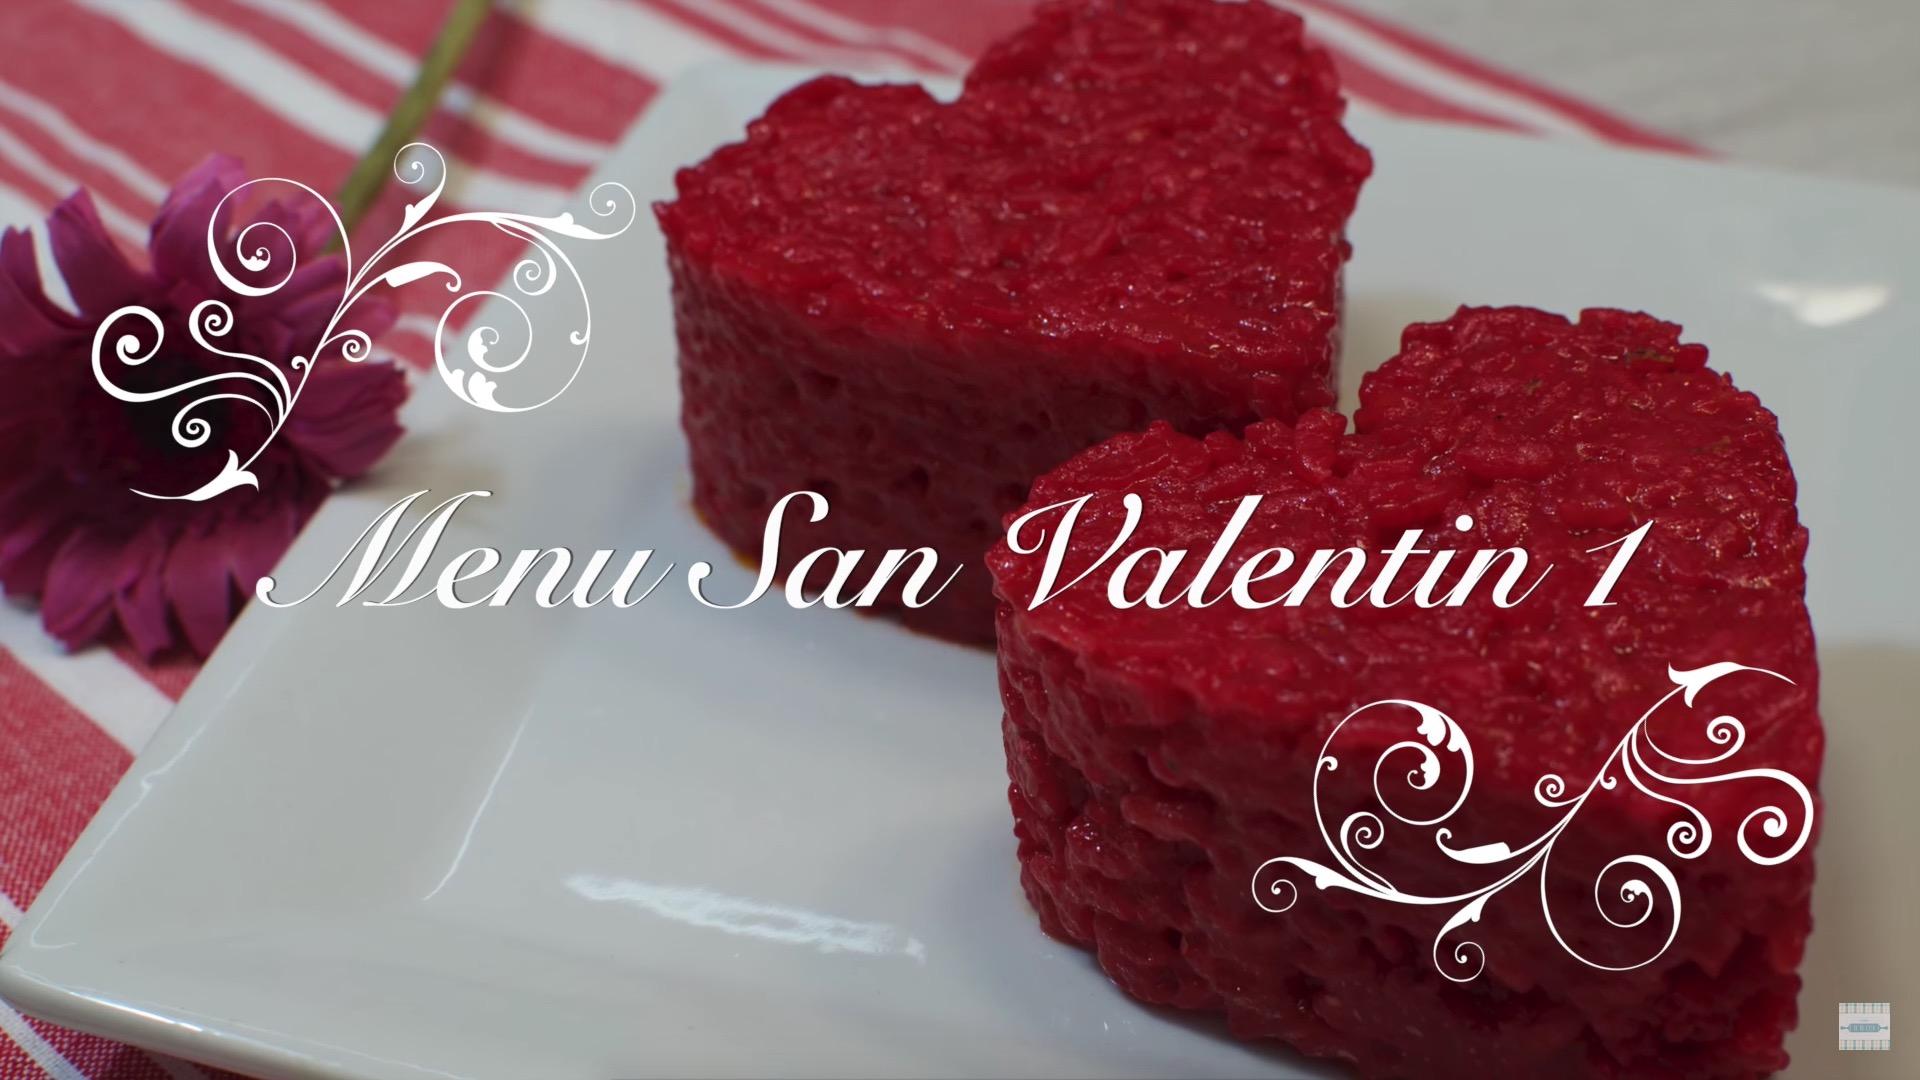 Menu de San Valentin